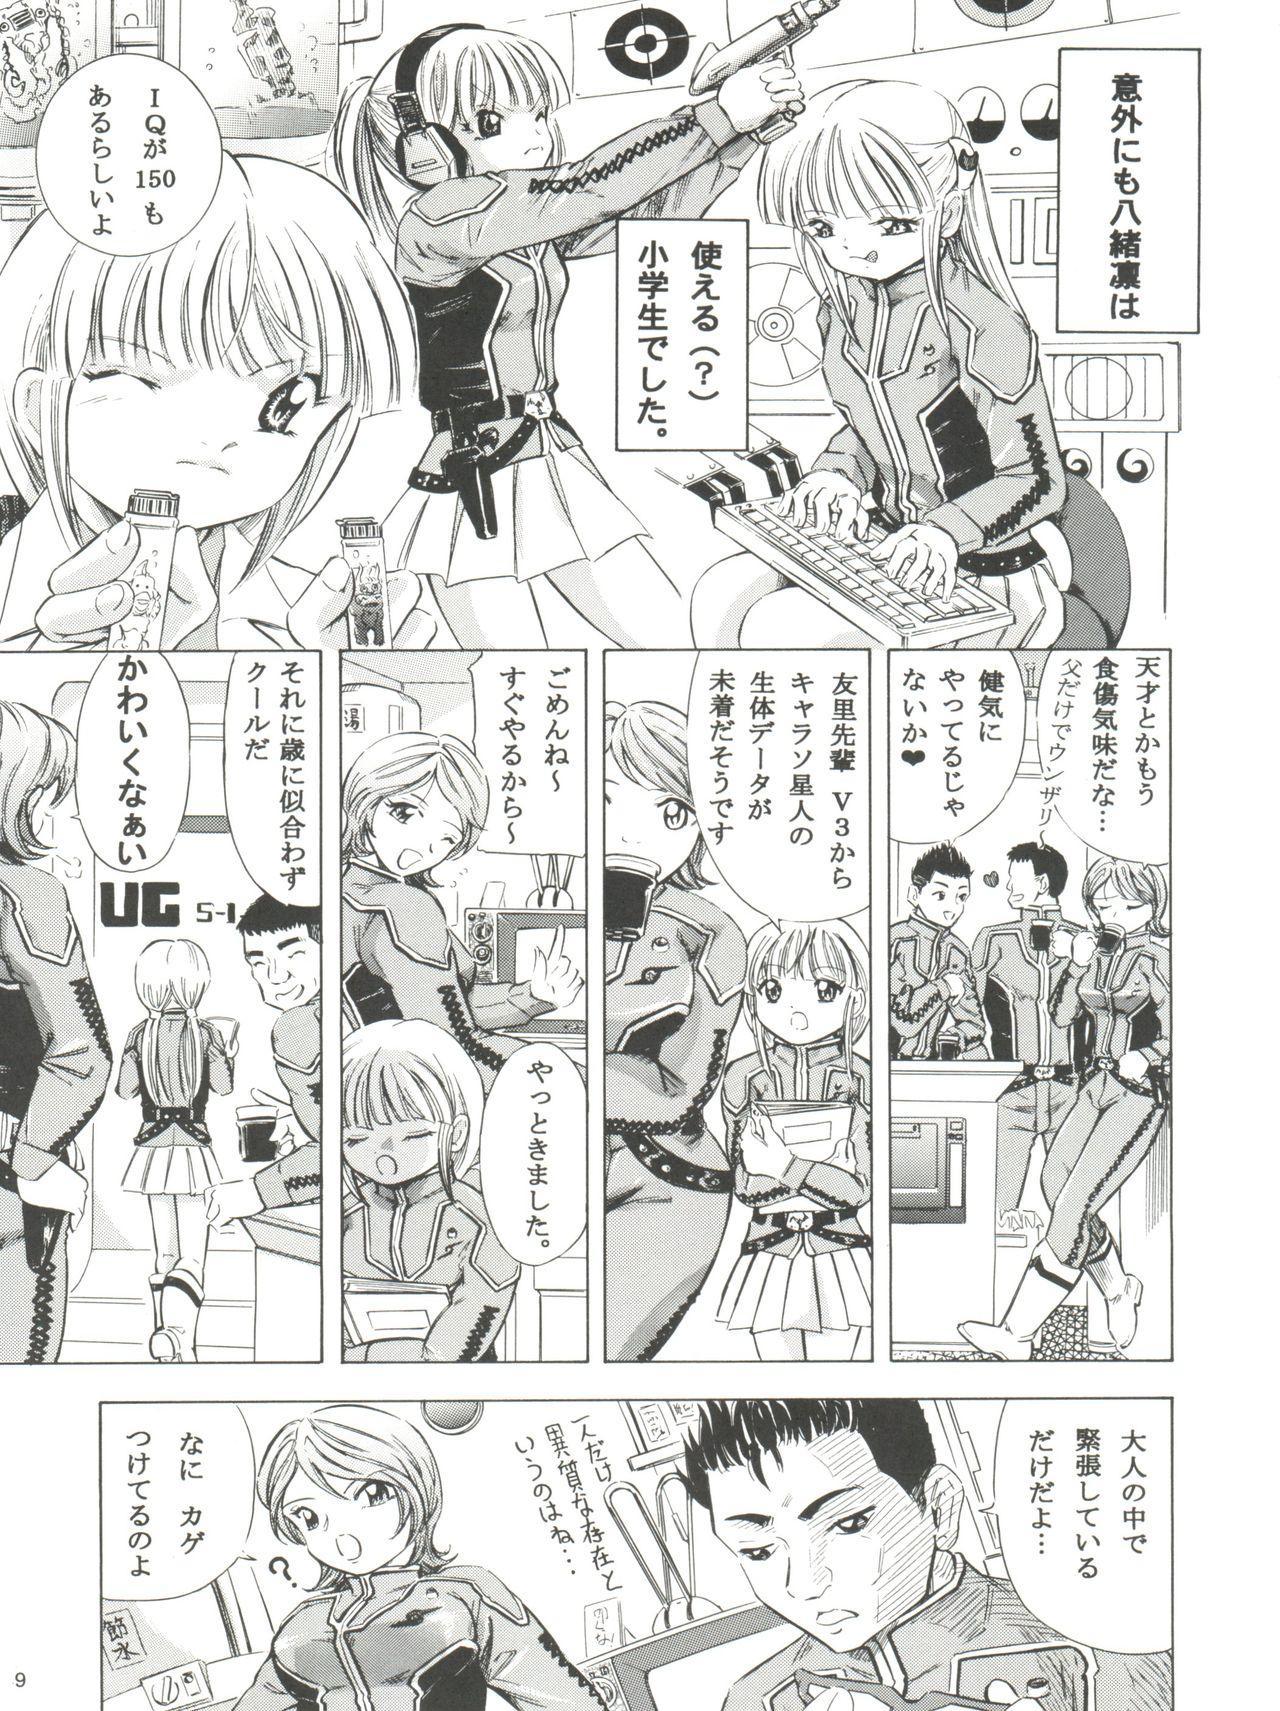 Mahou Kyuushiki 15 8